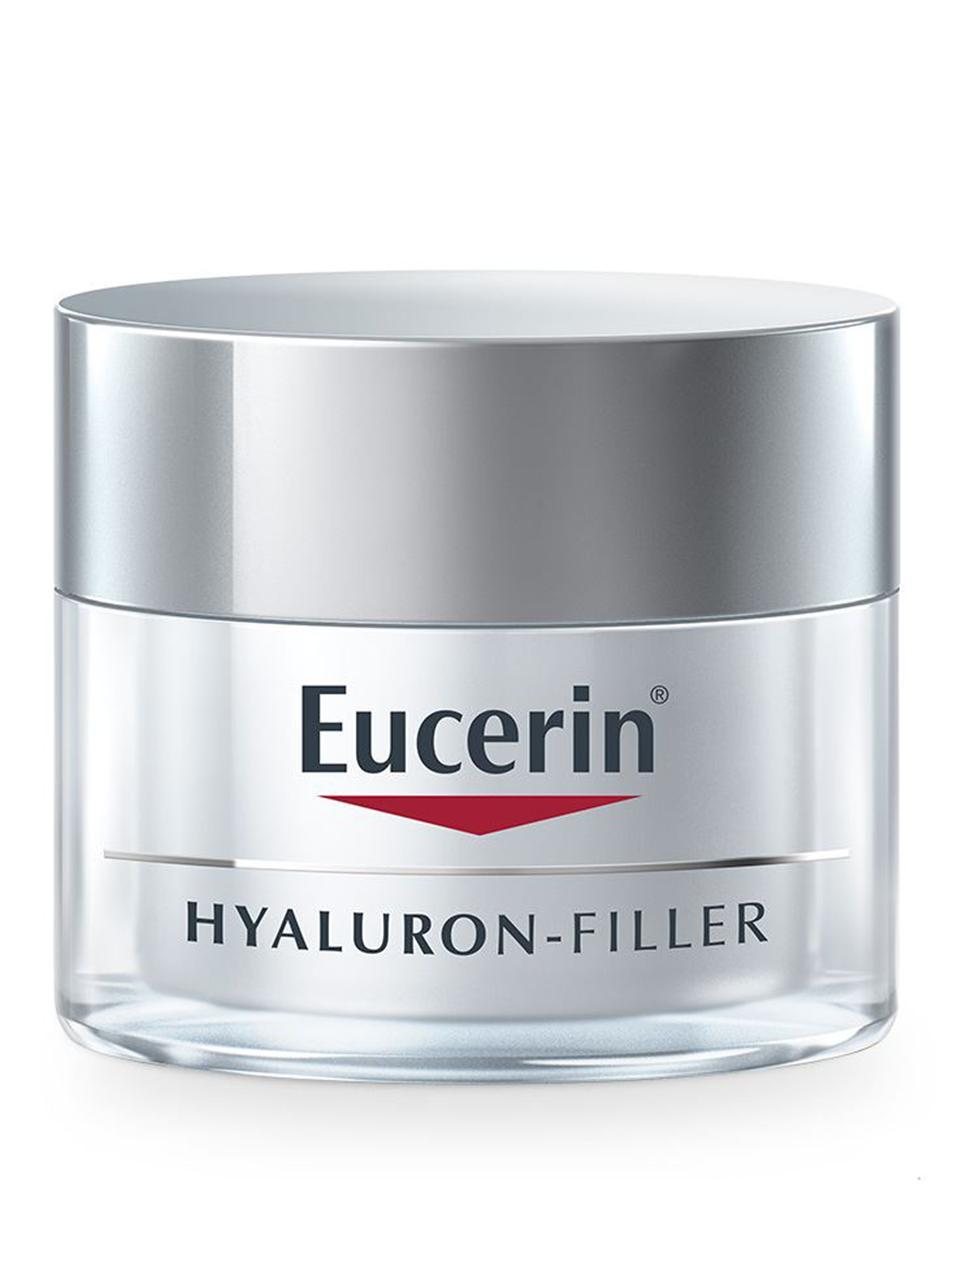 Eucerin HYALURON-FILLER TAGESPFLEGE für trockene Haut